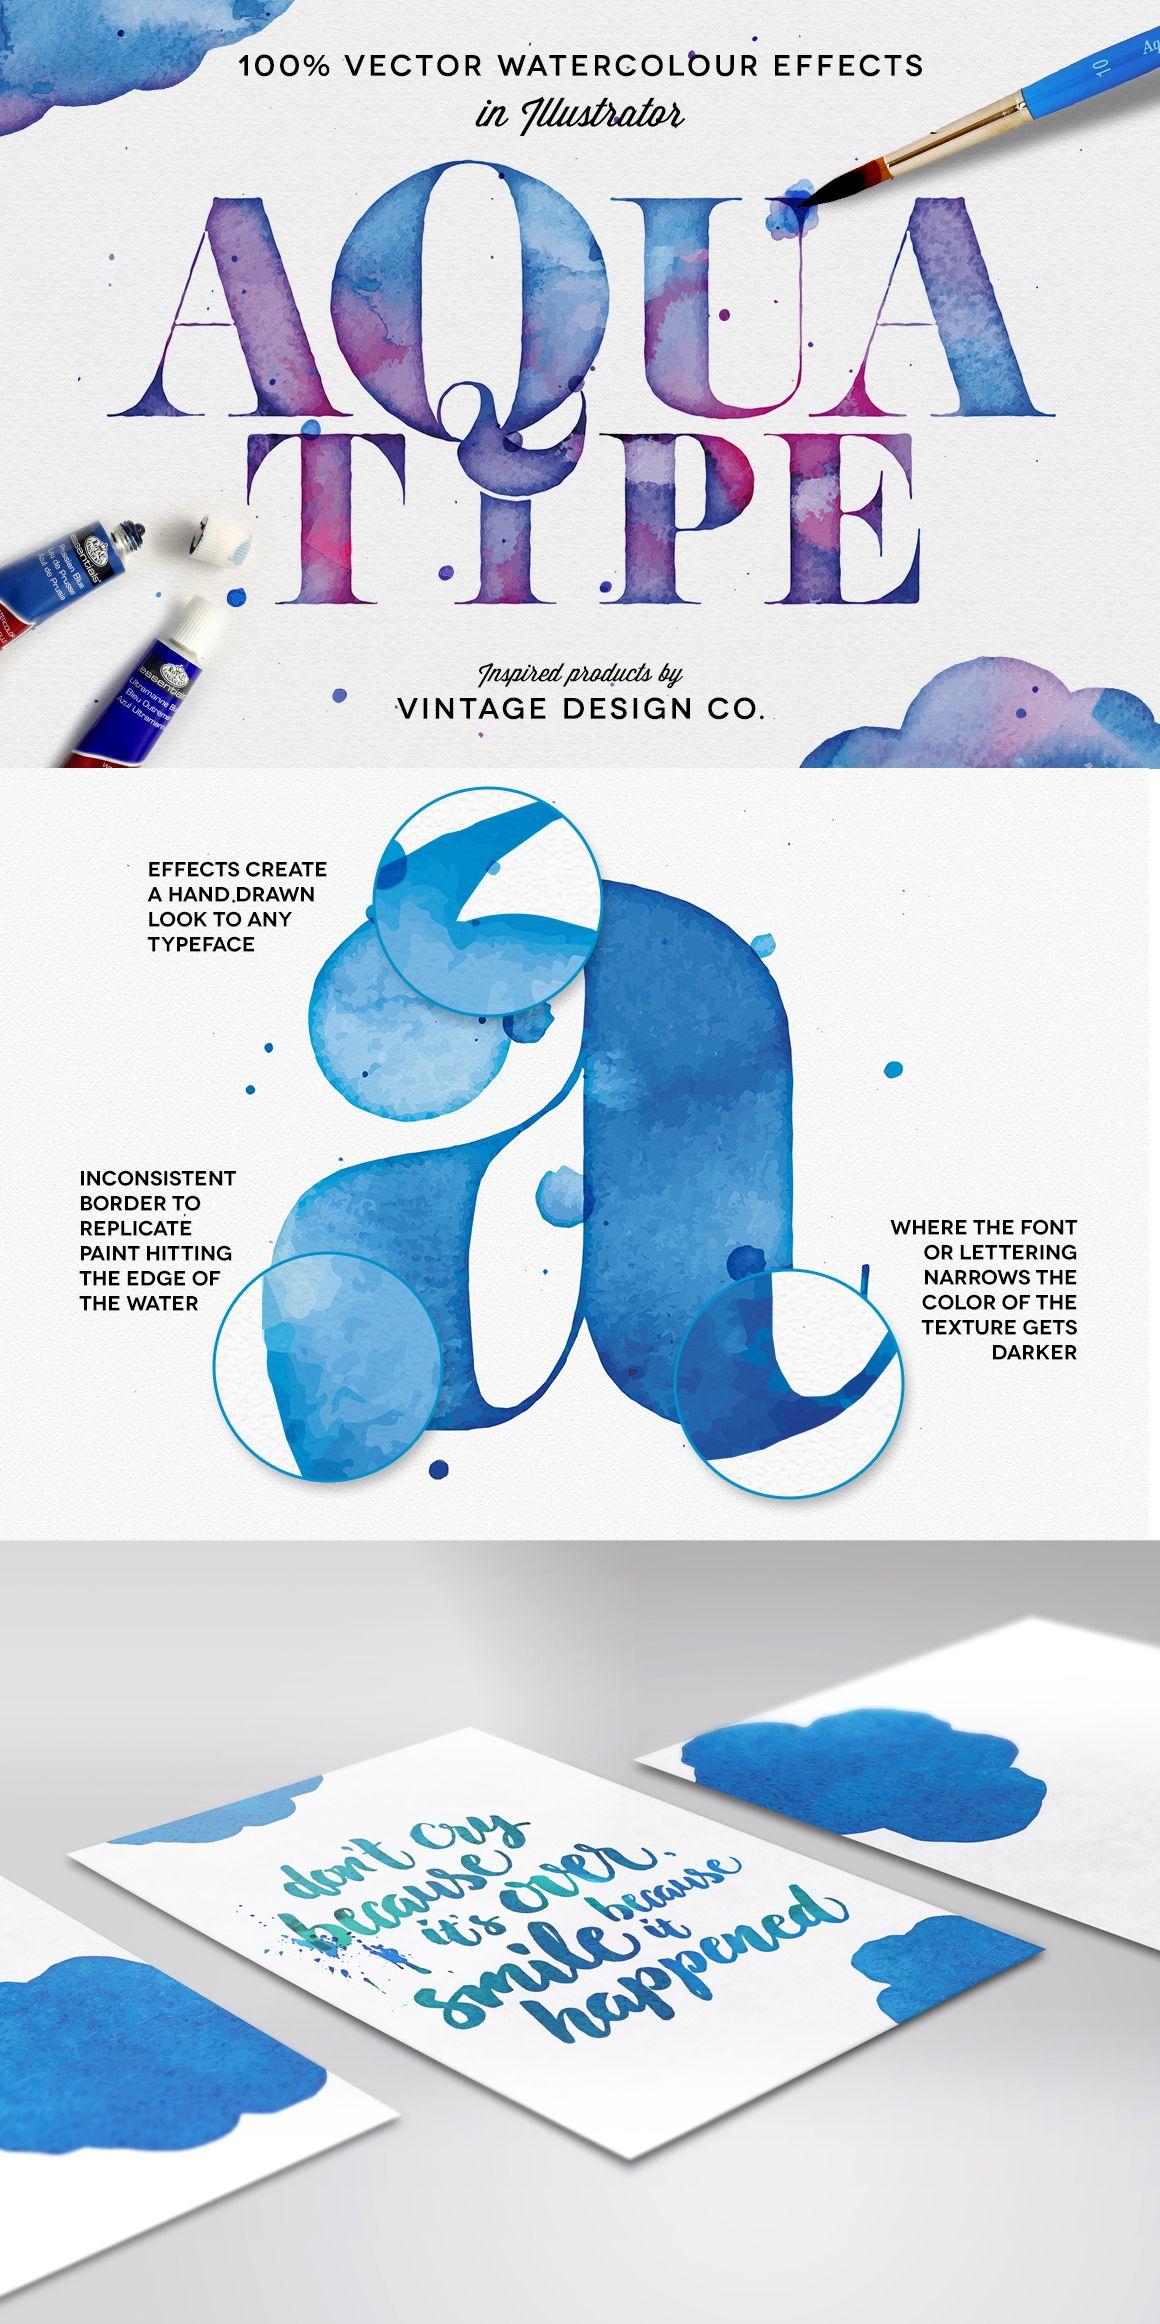 Aquatype Vector Watercolor Effects Graphic Design Typography